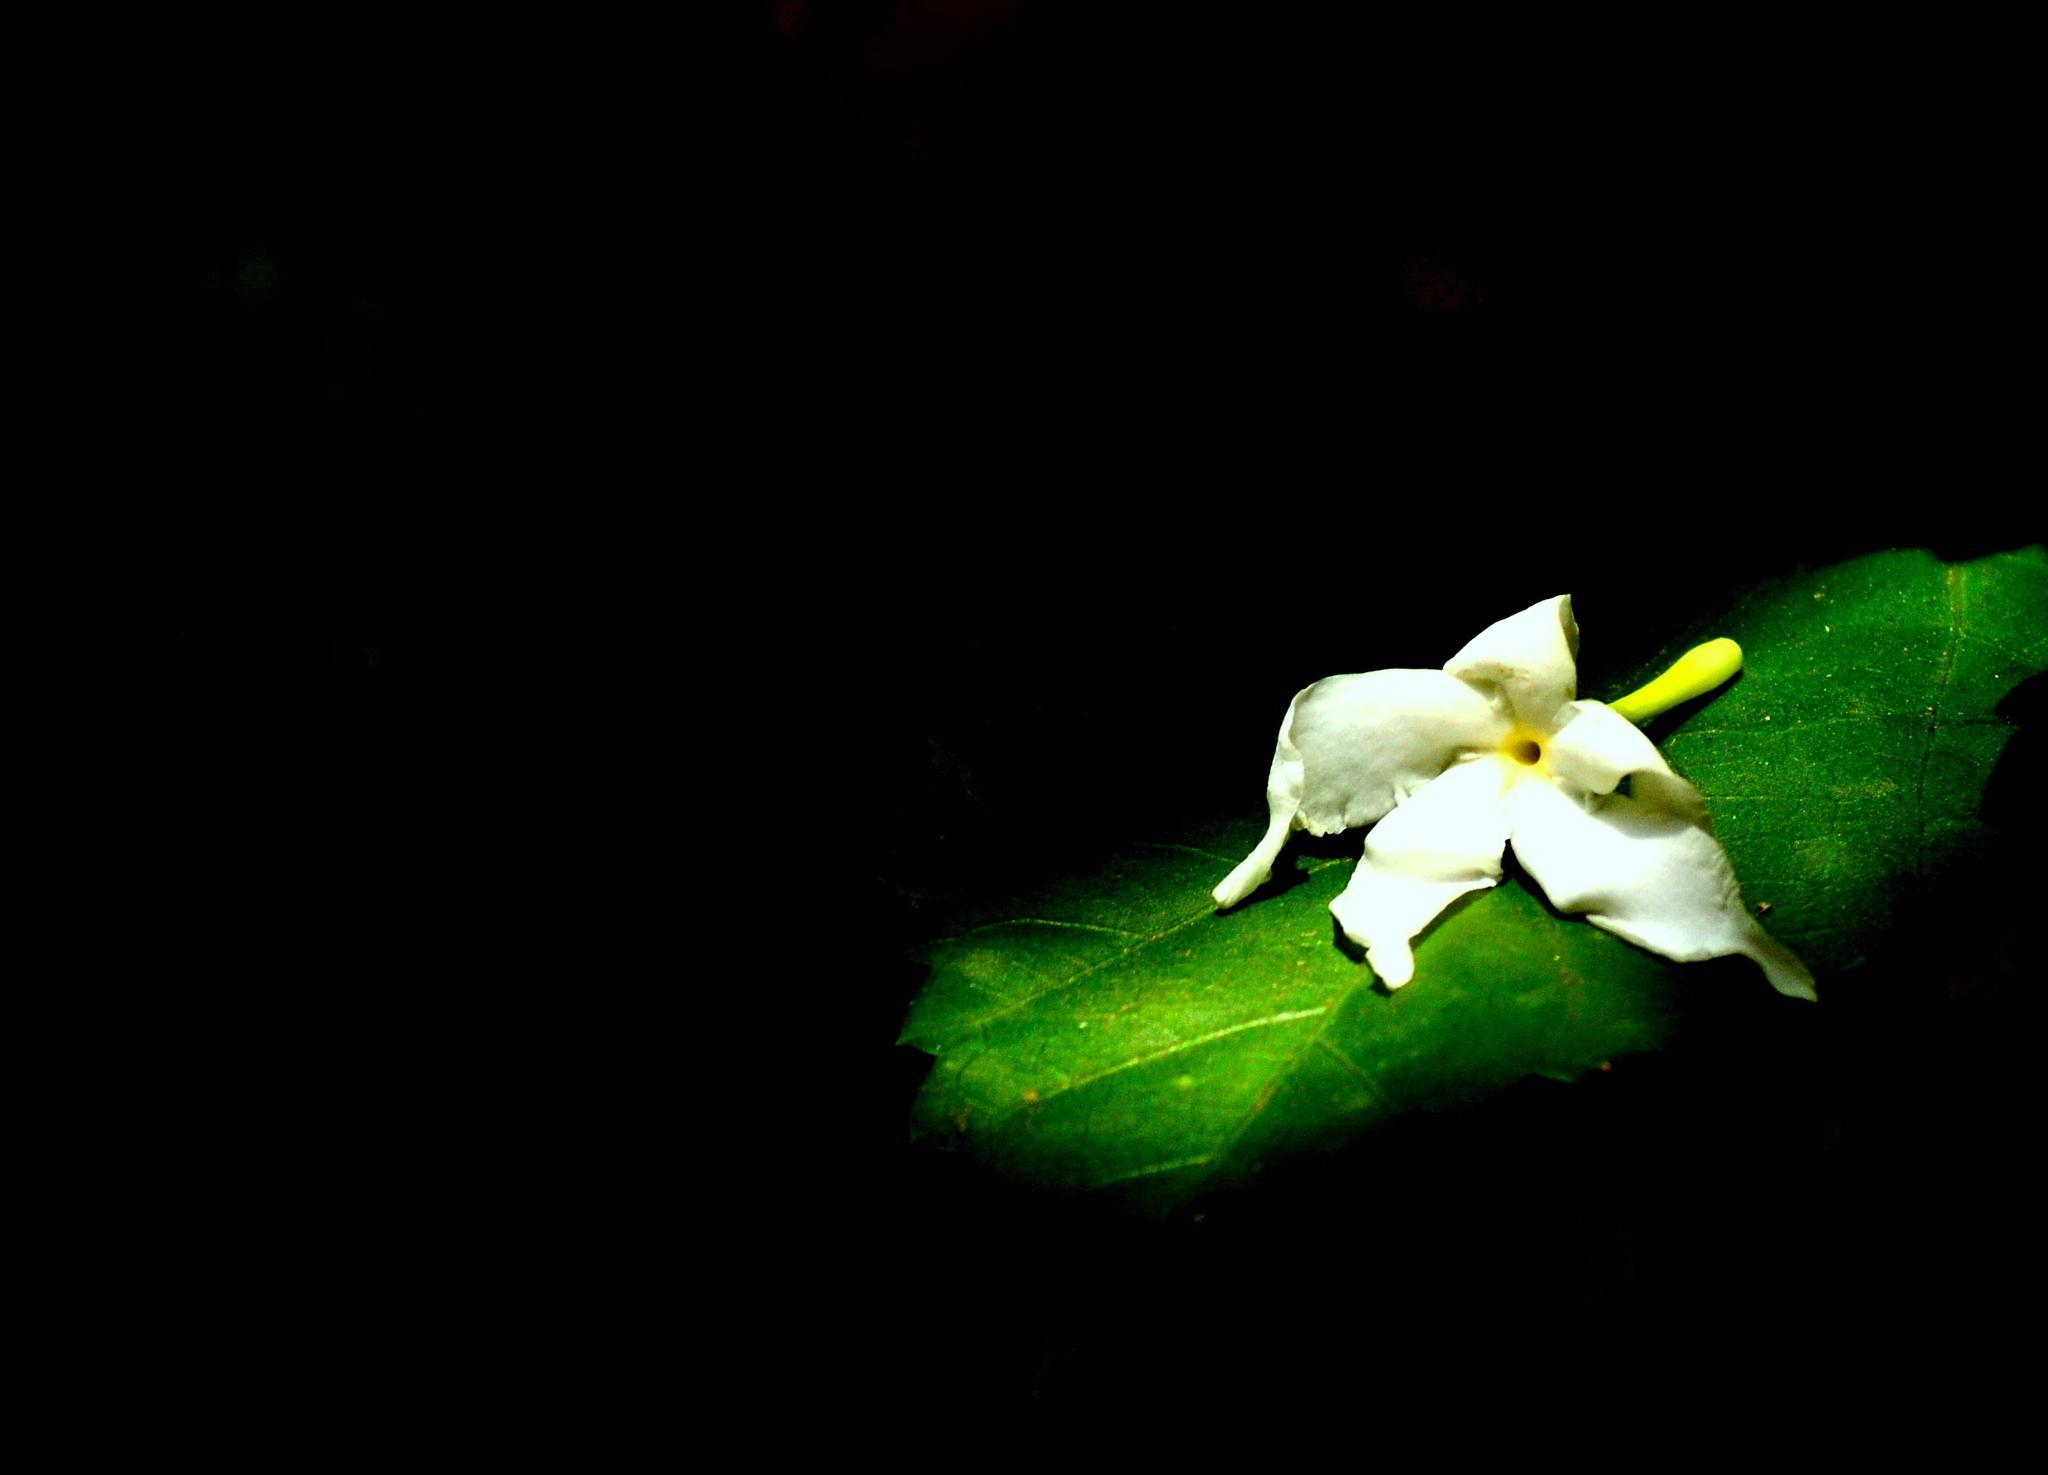 A fallen flower by Pradeep Krishnan